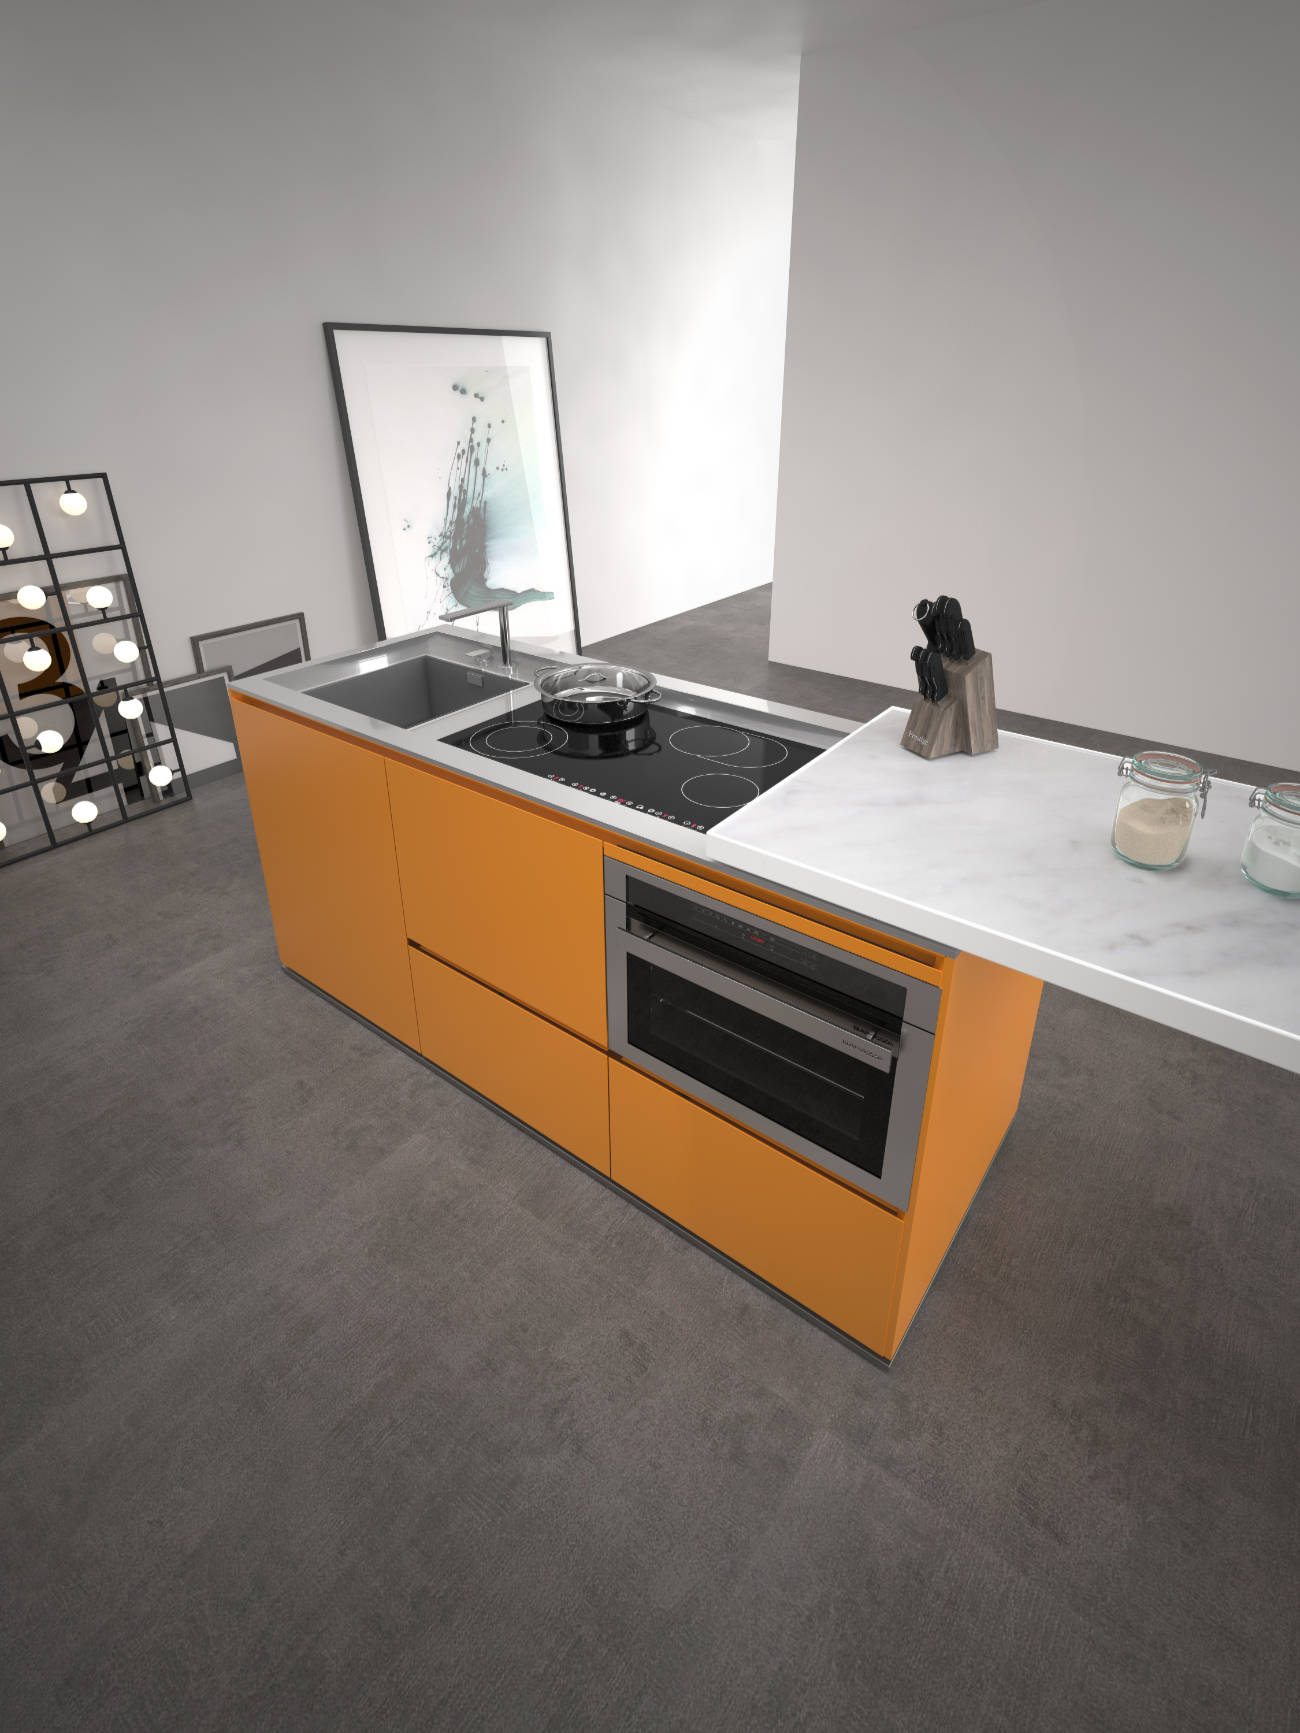 06G_Estel_Le case Italiane_Day_Cucina Wiwa__Isole Compact_Indoor